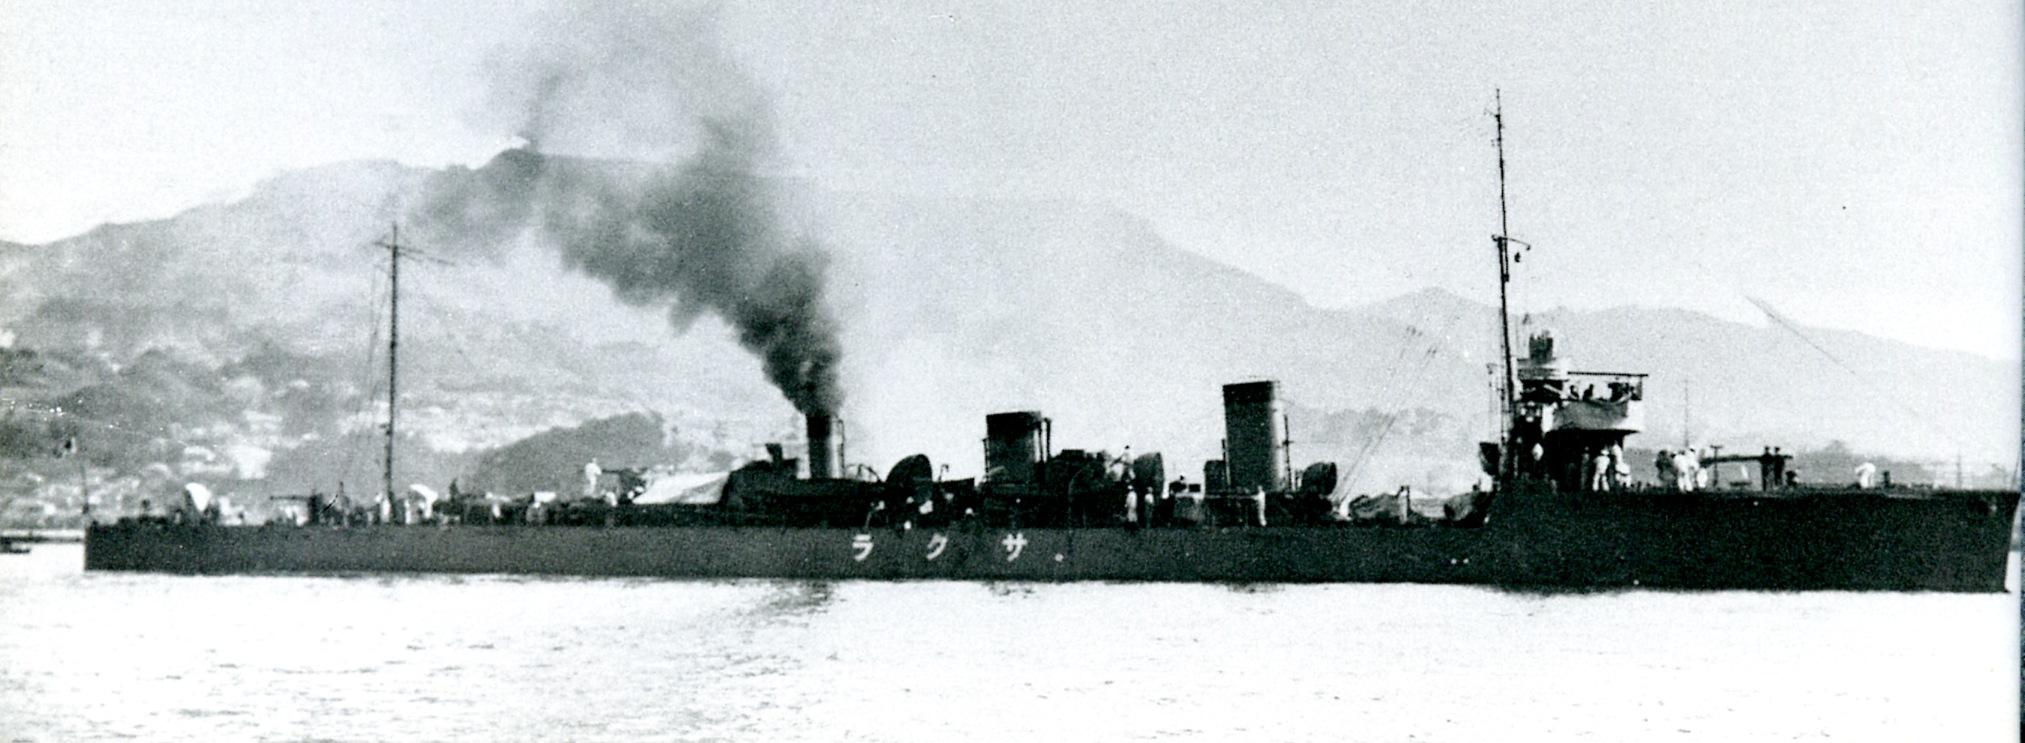 Tachibana (1912)